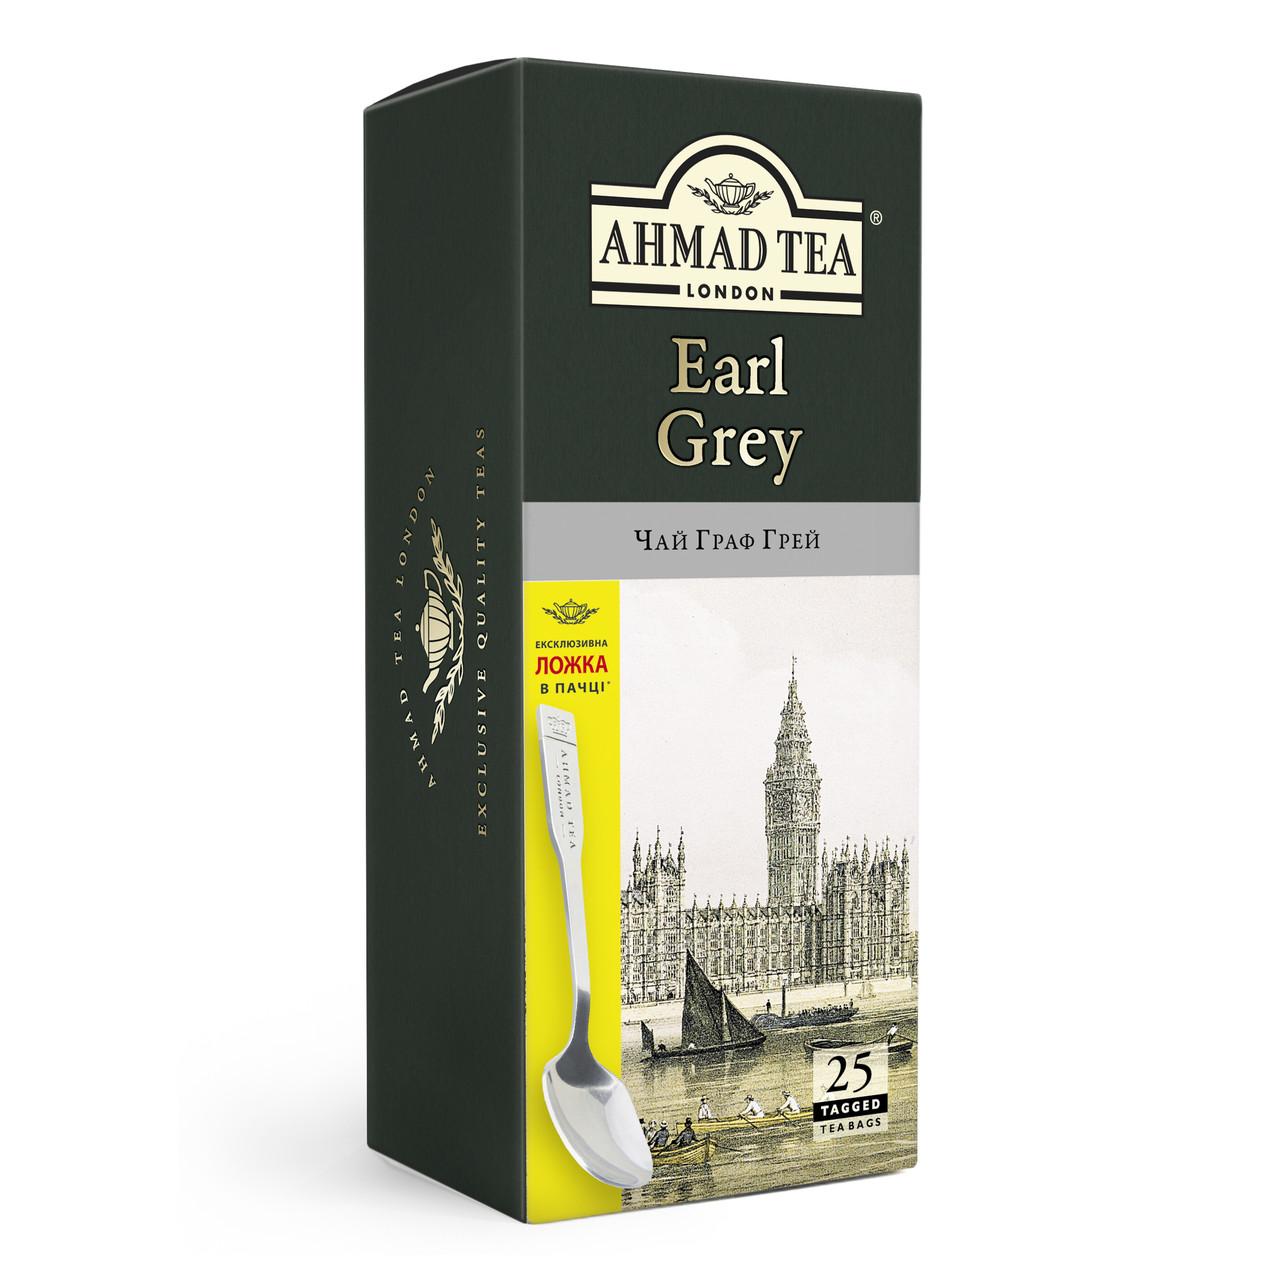 Чай с ложкой Ахмад с бергамотом в пакетиках Граф Грей 25 х 2 г